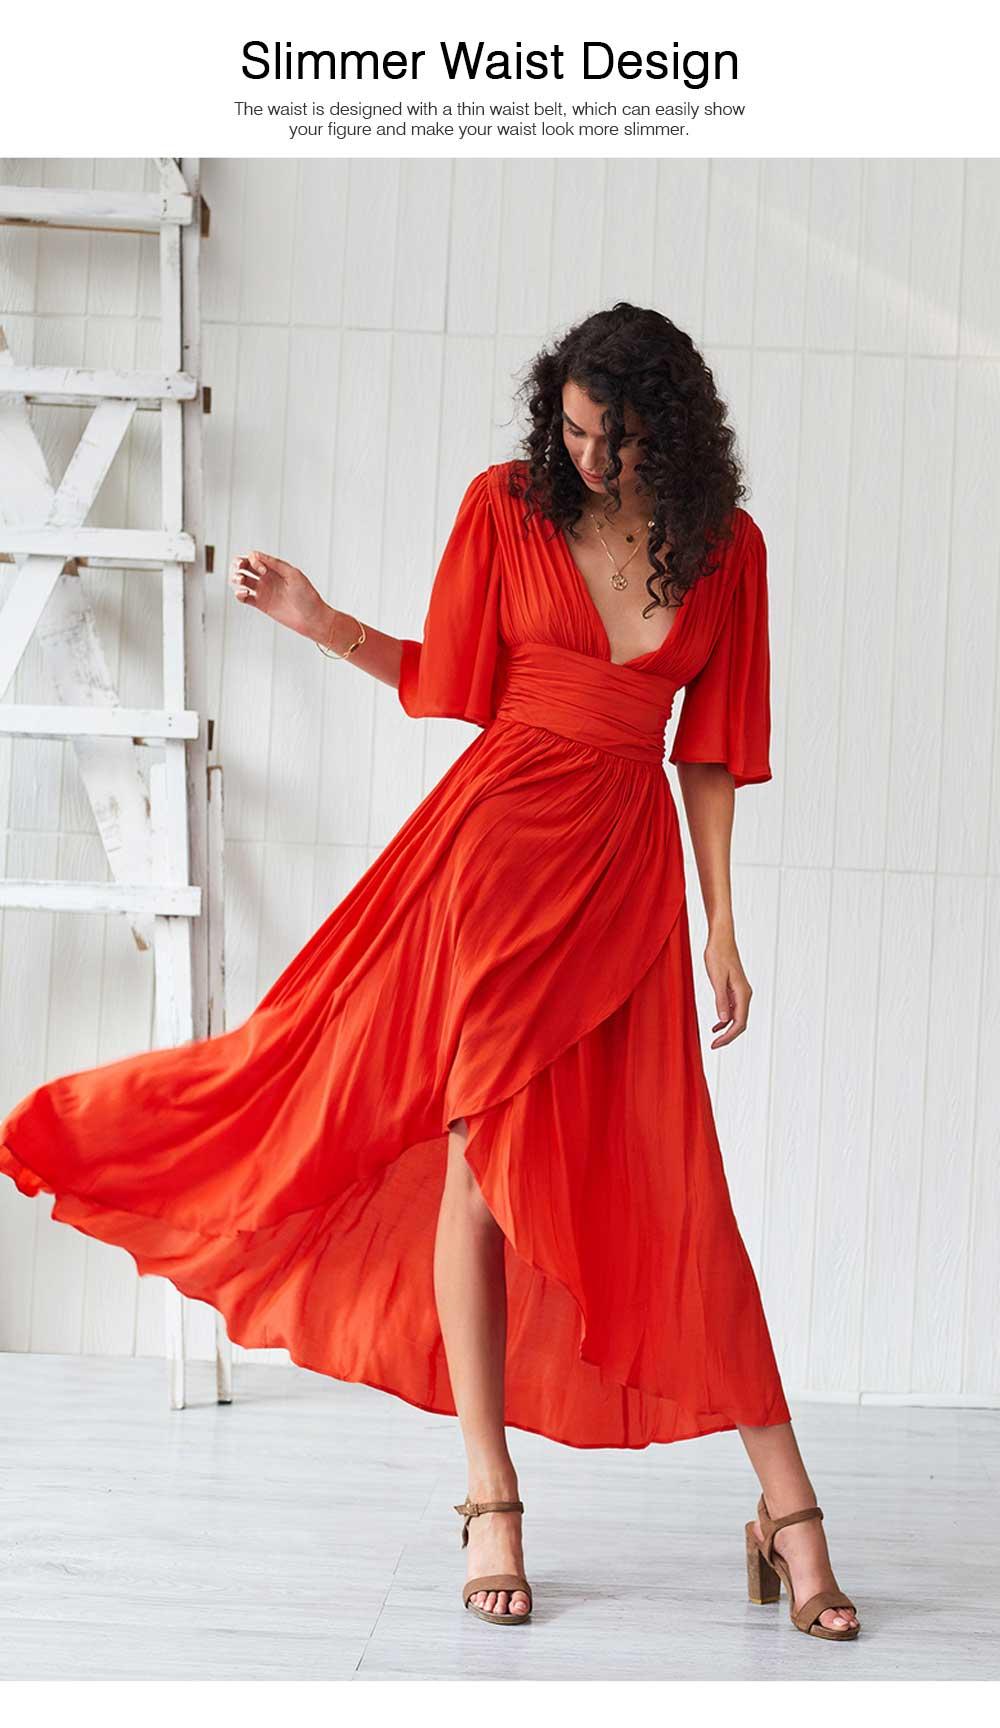 Deep V-neck Bohemian Dress Slim Waist Belt Irregular Style Orange Skirt Maxi Dress Summer for Women 4